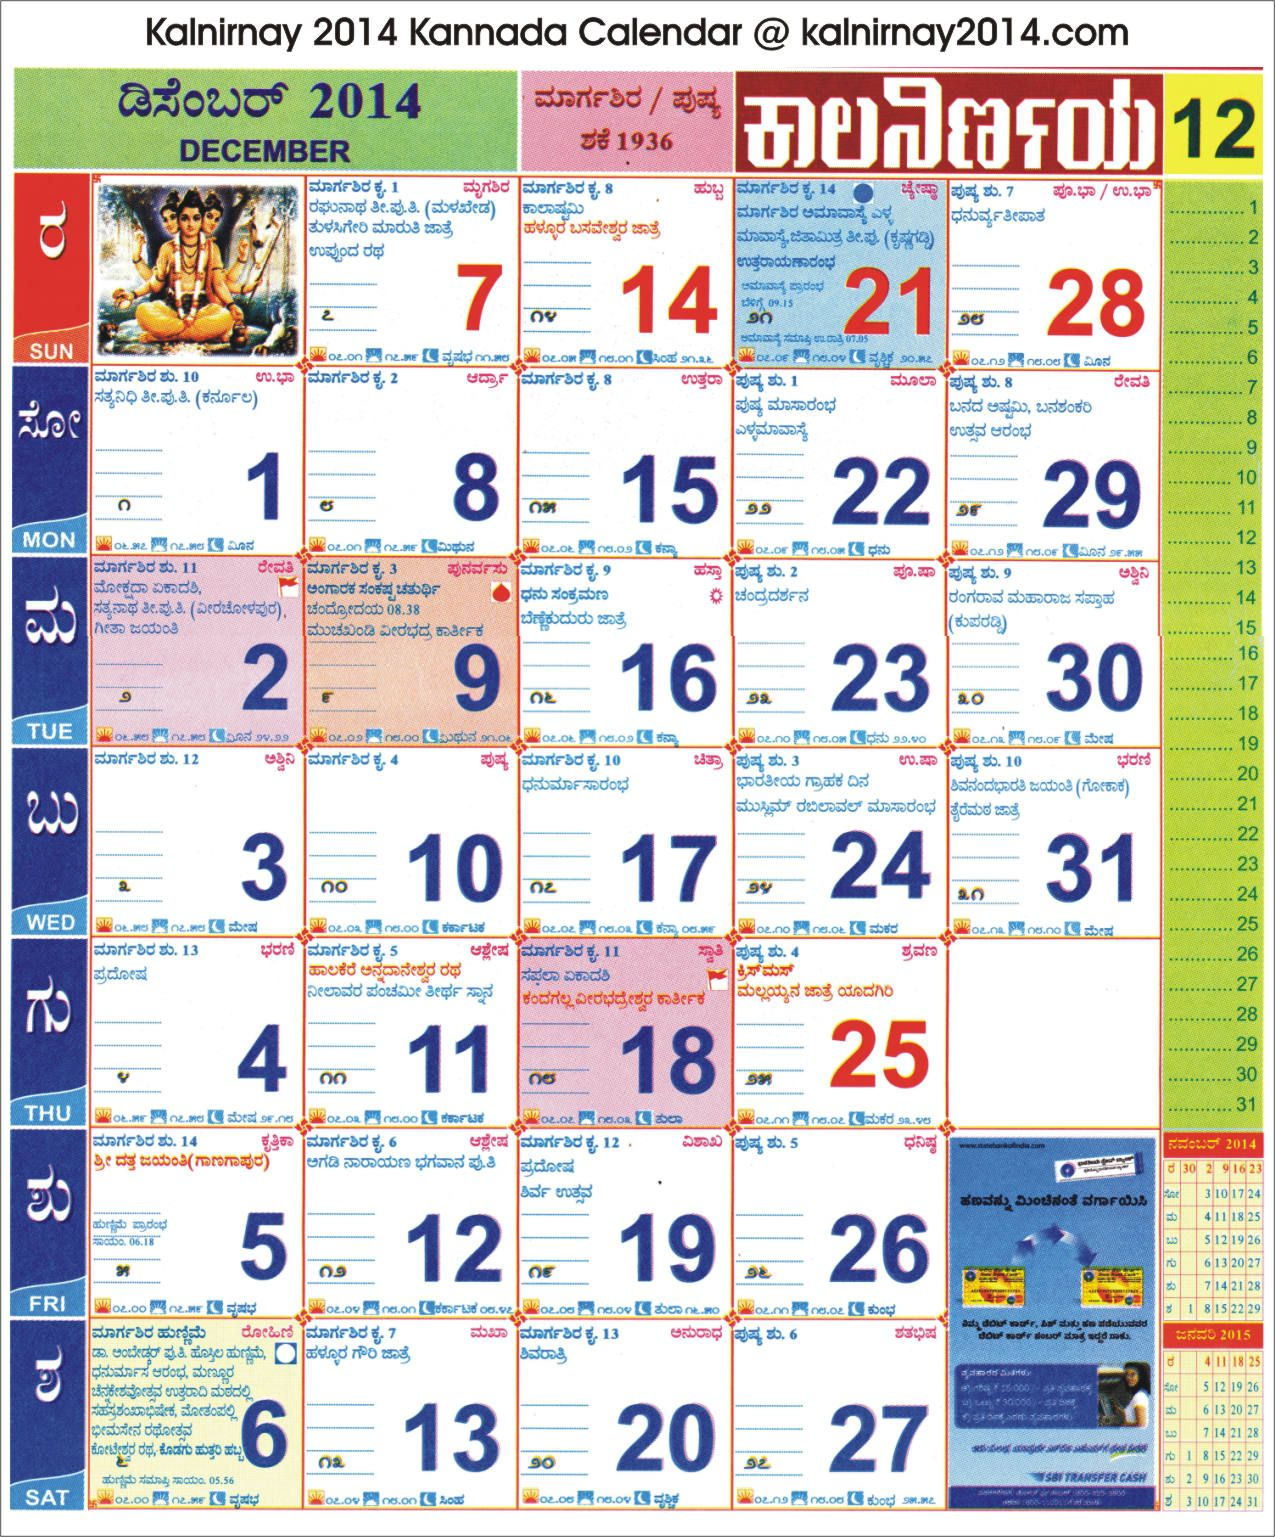 December 2014 Kannada Kalnirnay Calendar September